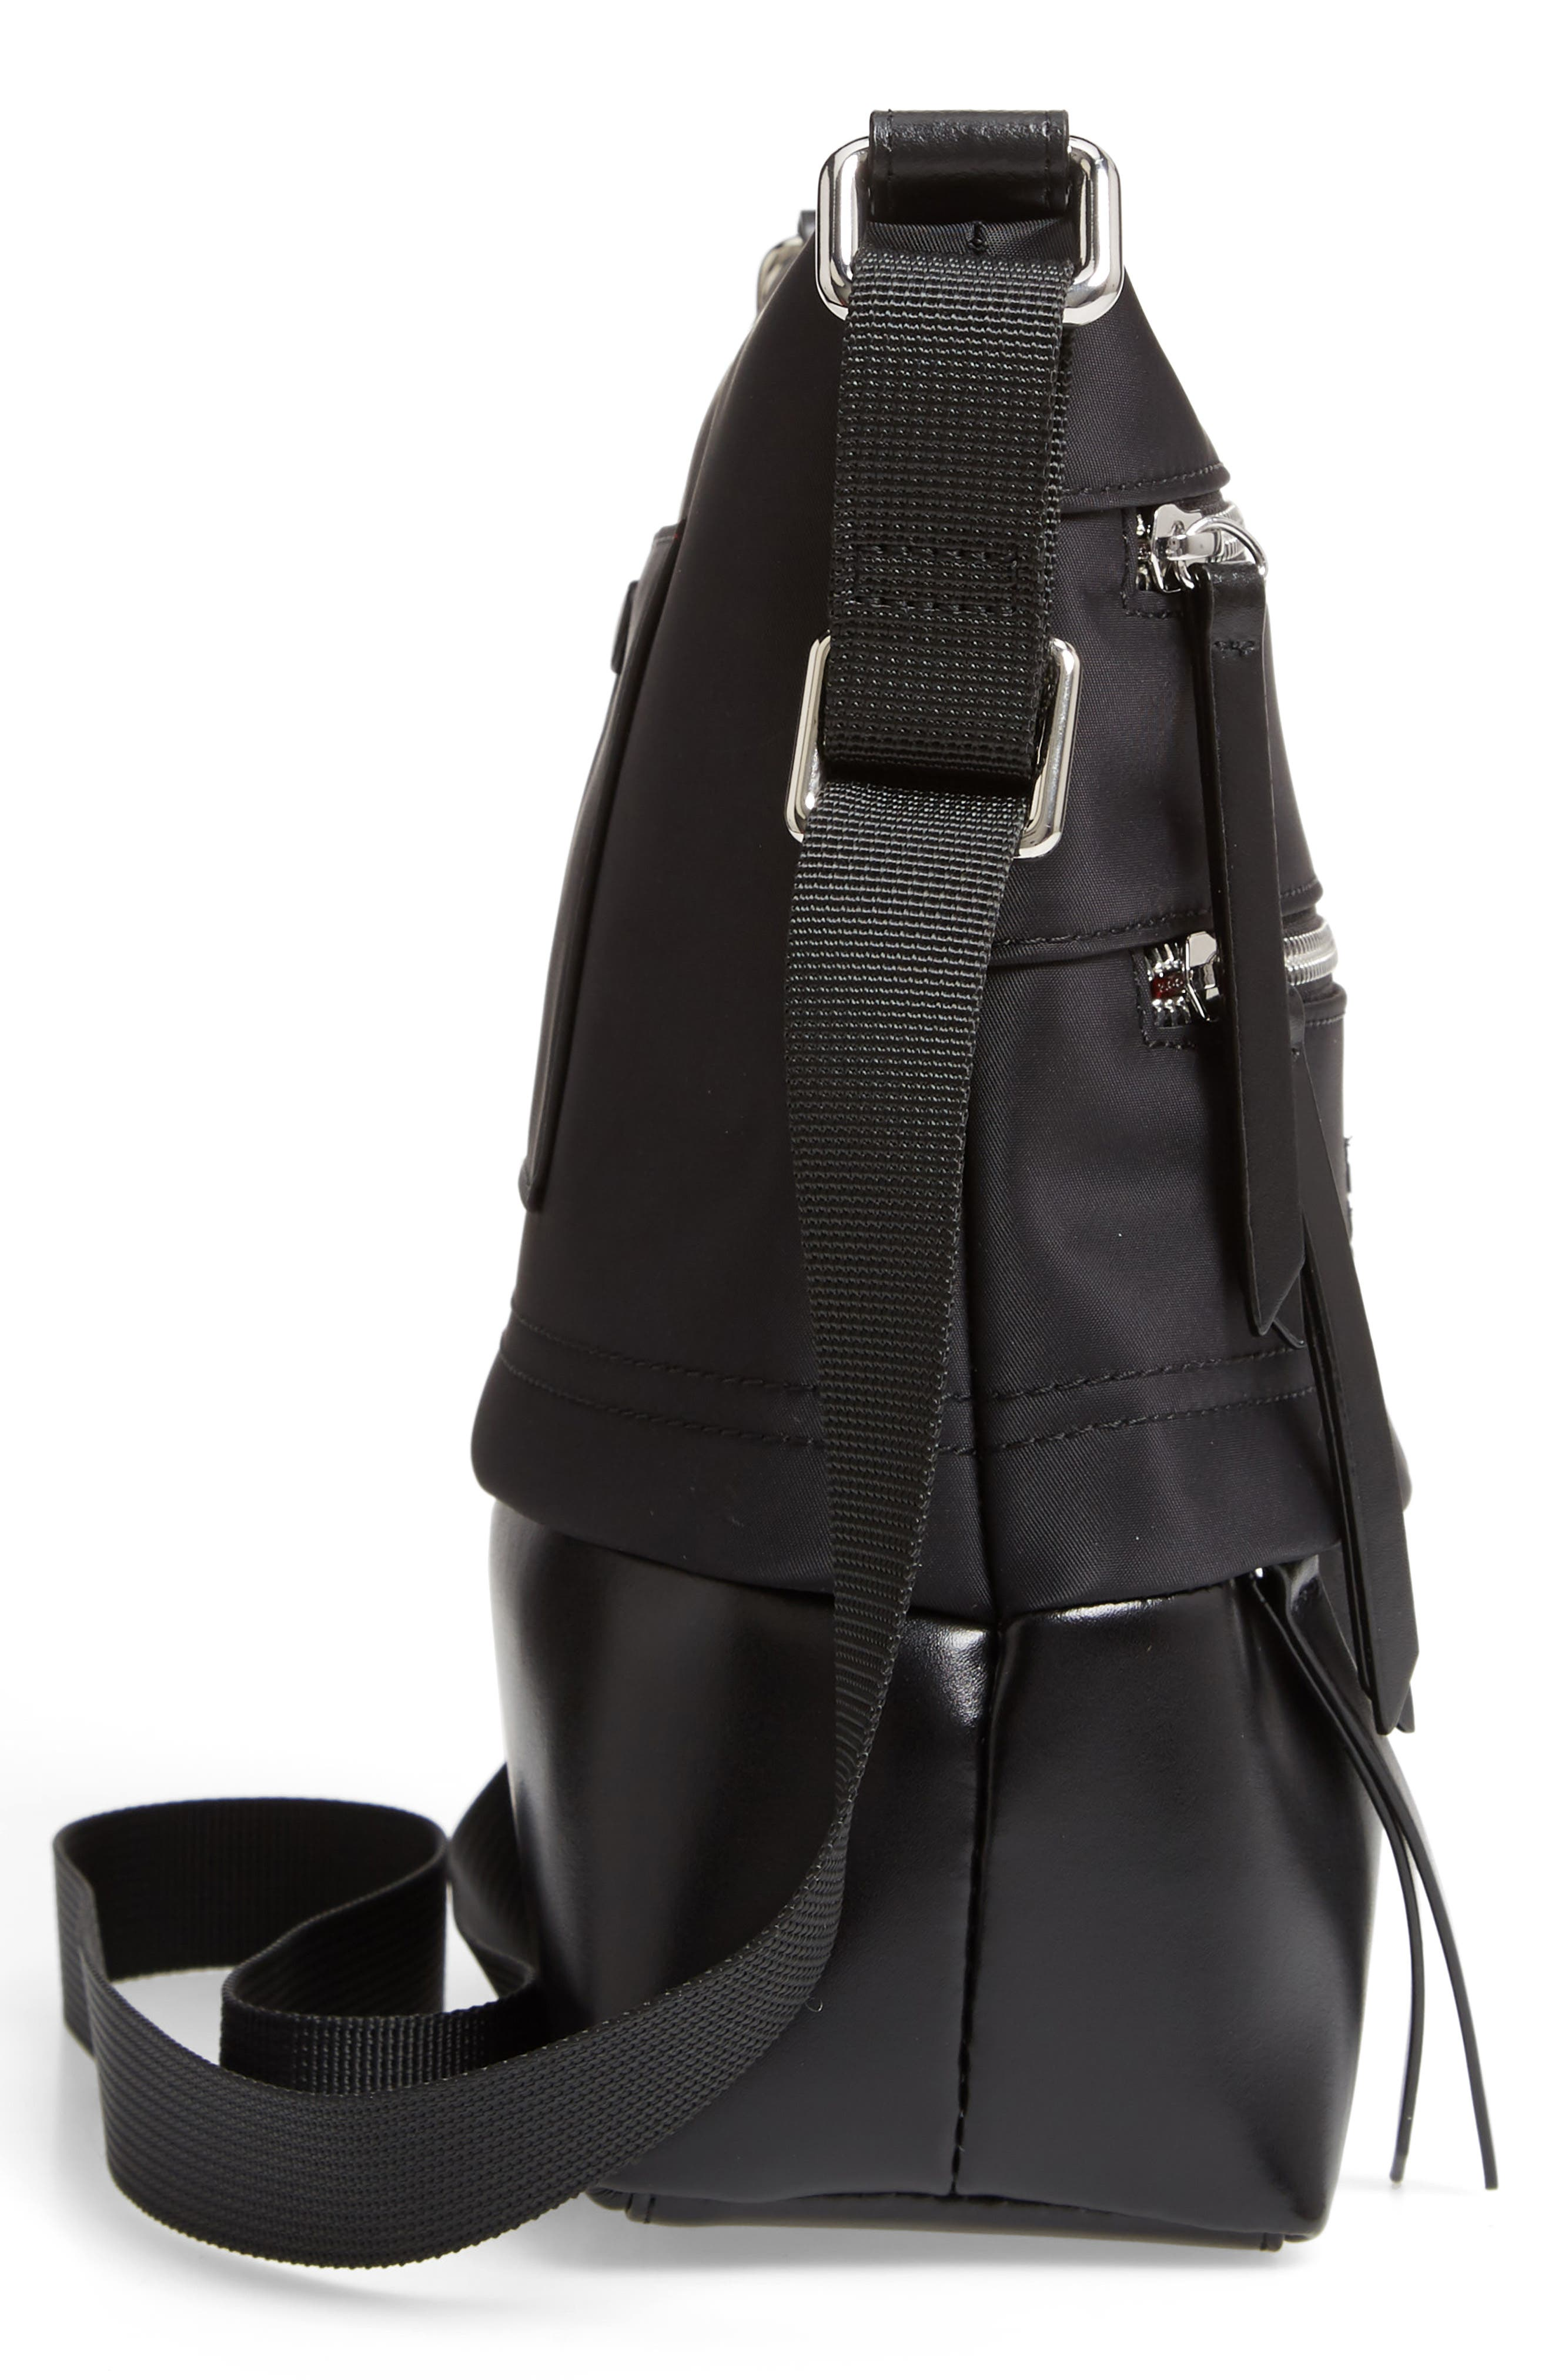 Wanda Nylon Sport RFID Travel Crossbody Bag,                             Alternate thumbnail 5, color,                             001